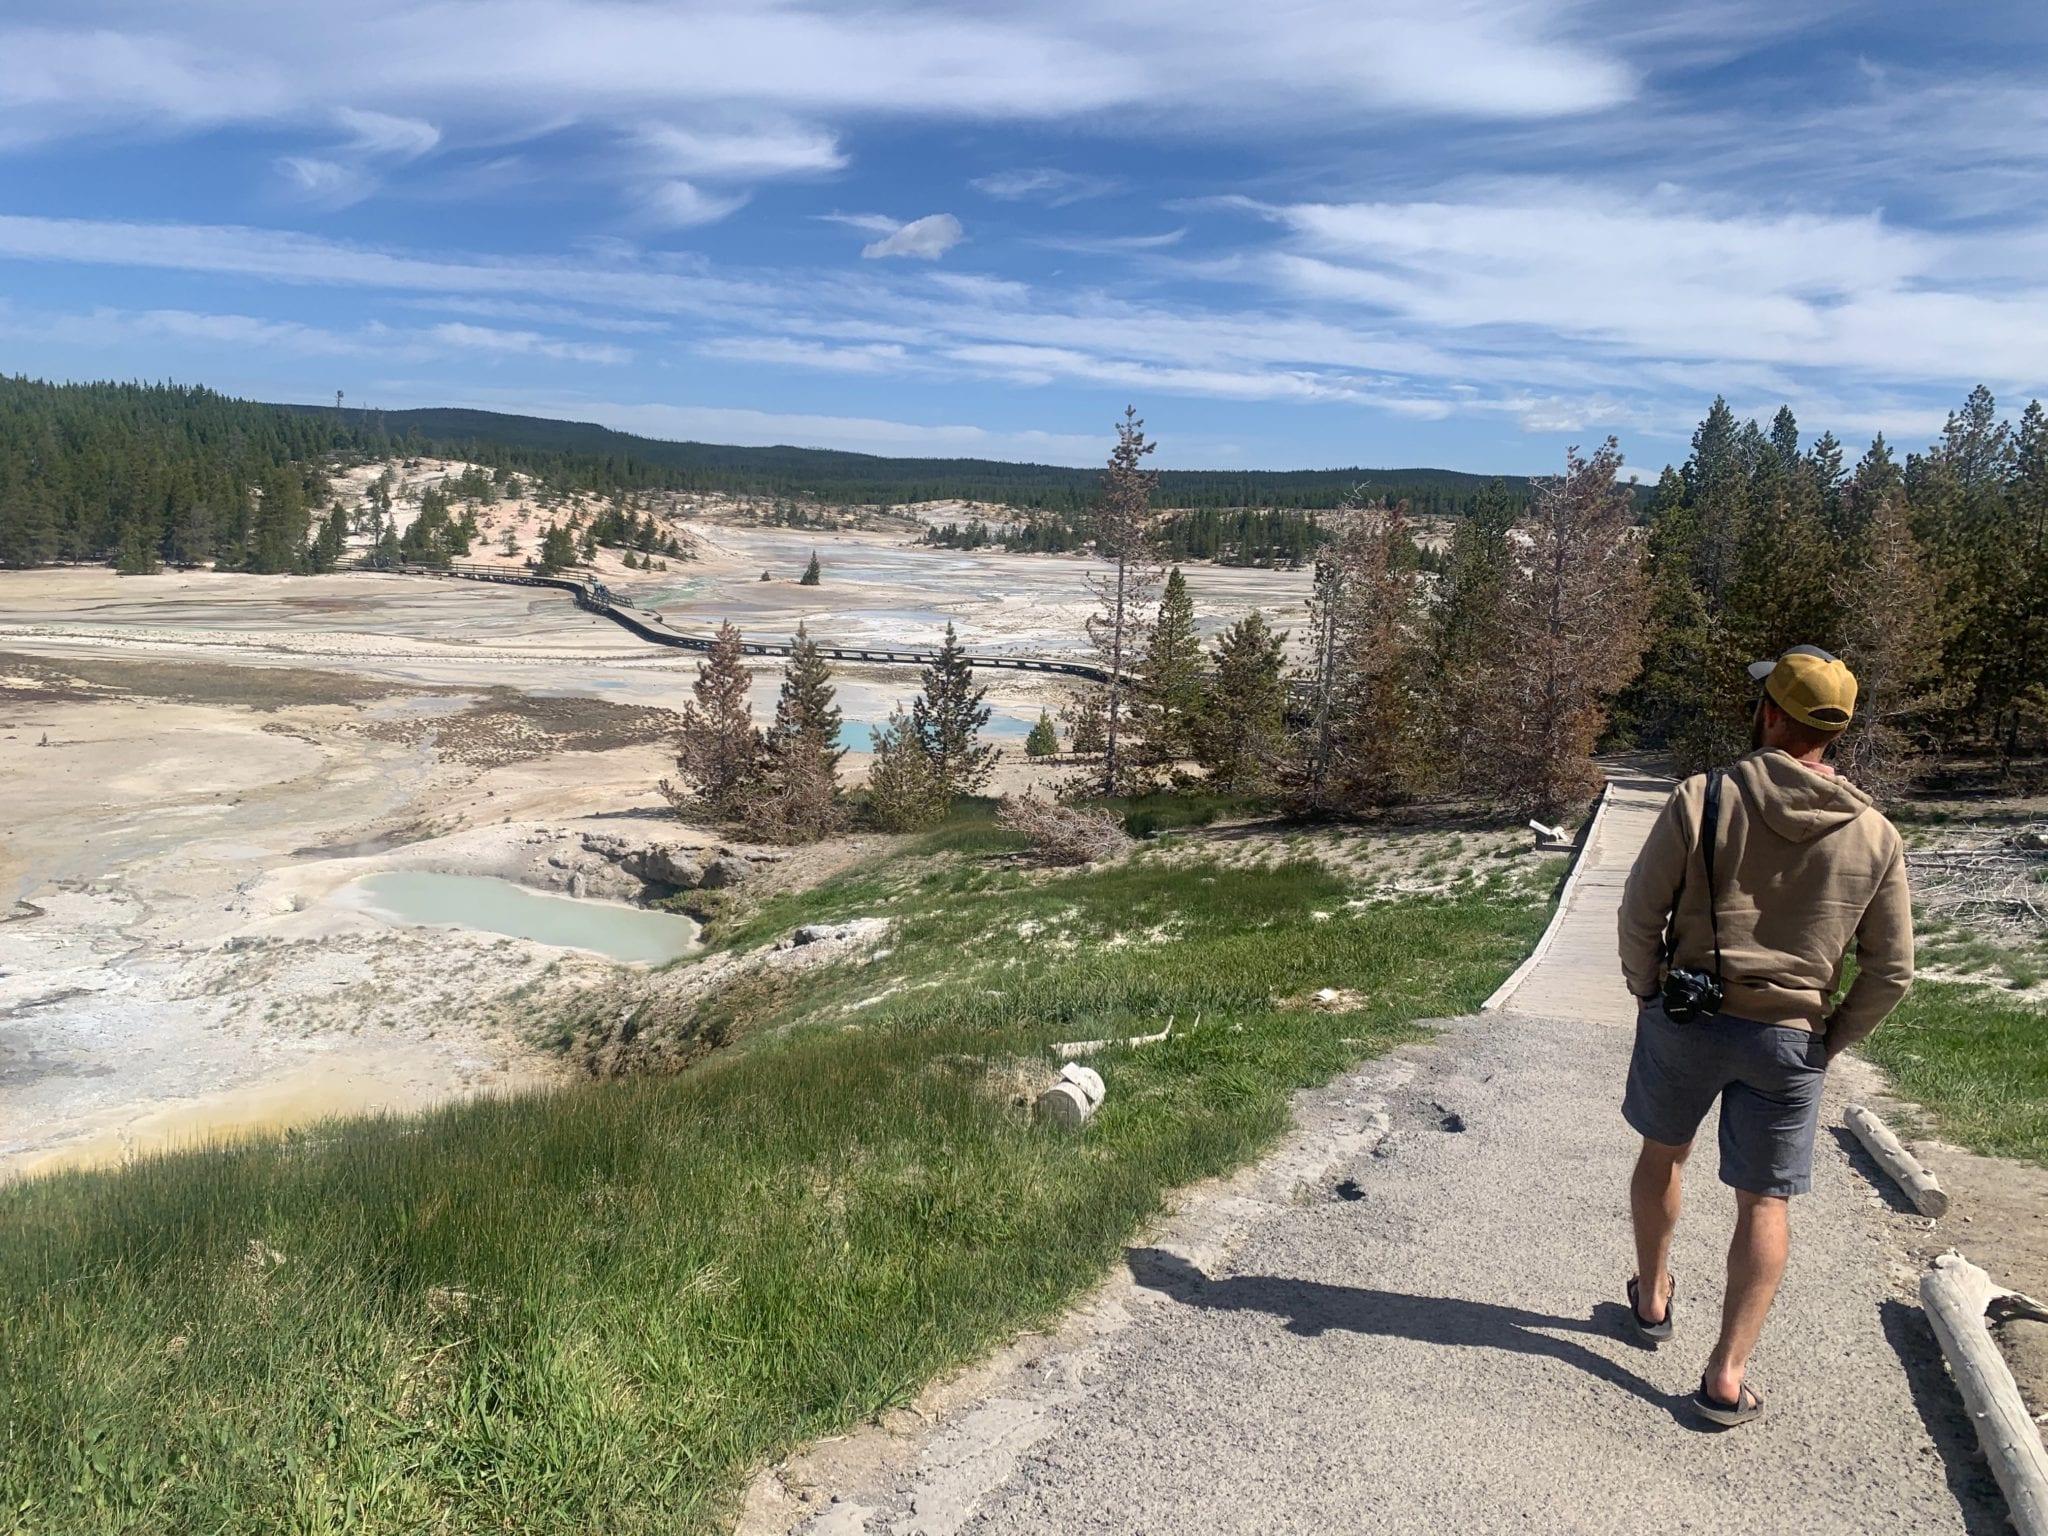 Walking the boardwalks of geyser pools